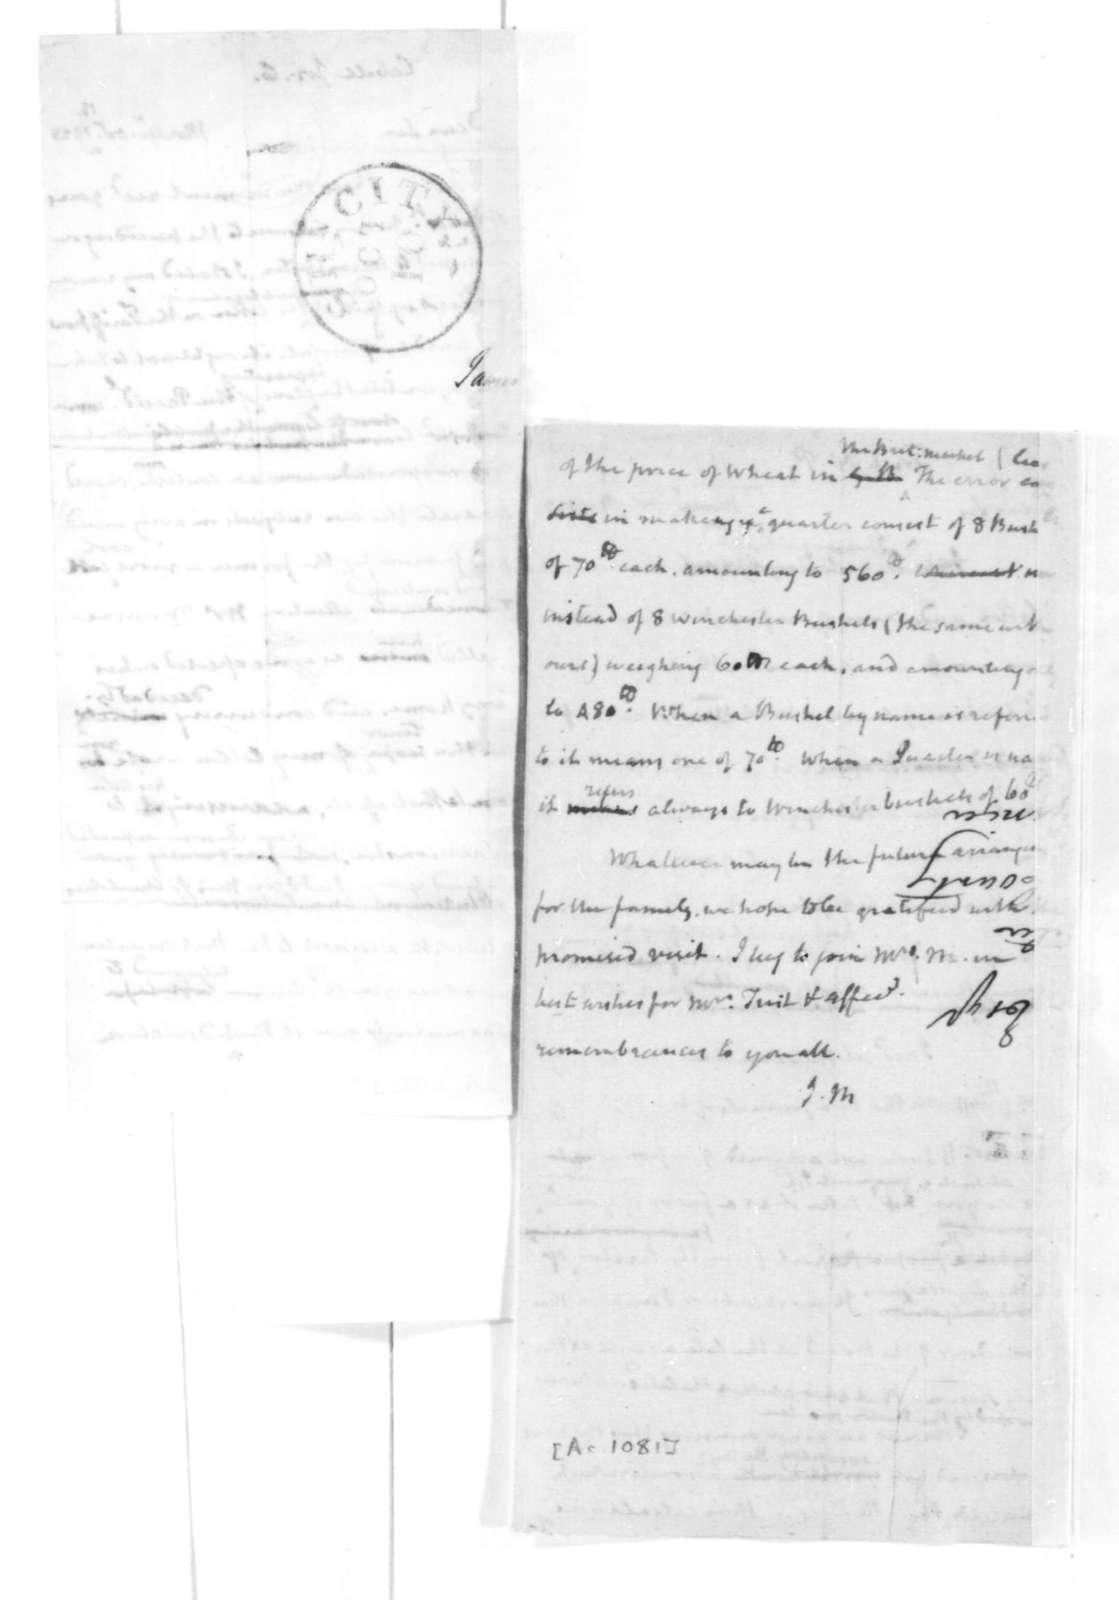 James Madison to Nicholas P. Trist, October 12, 1828.